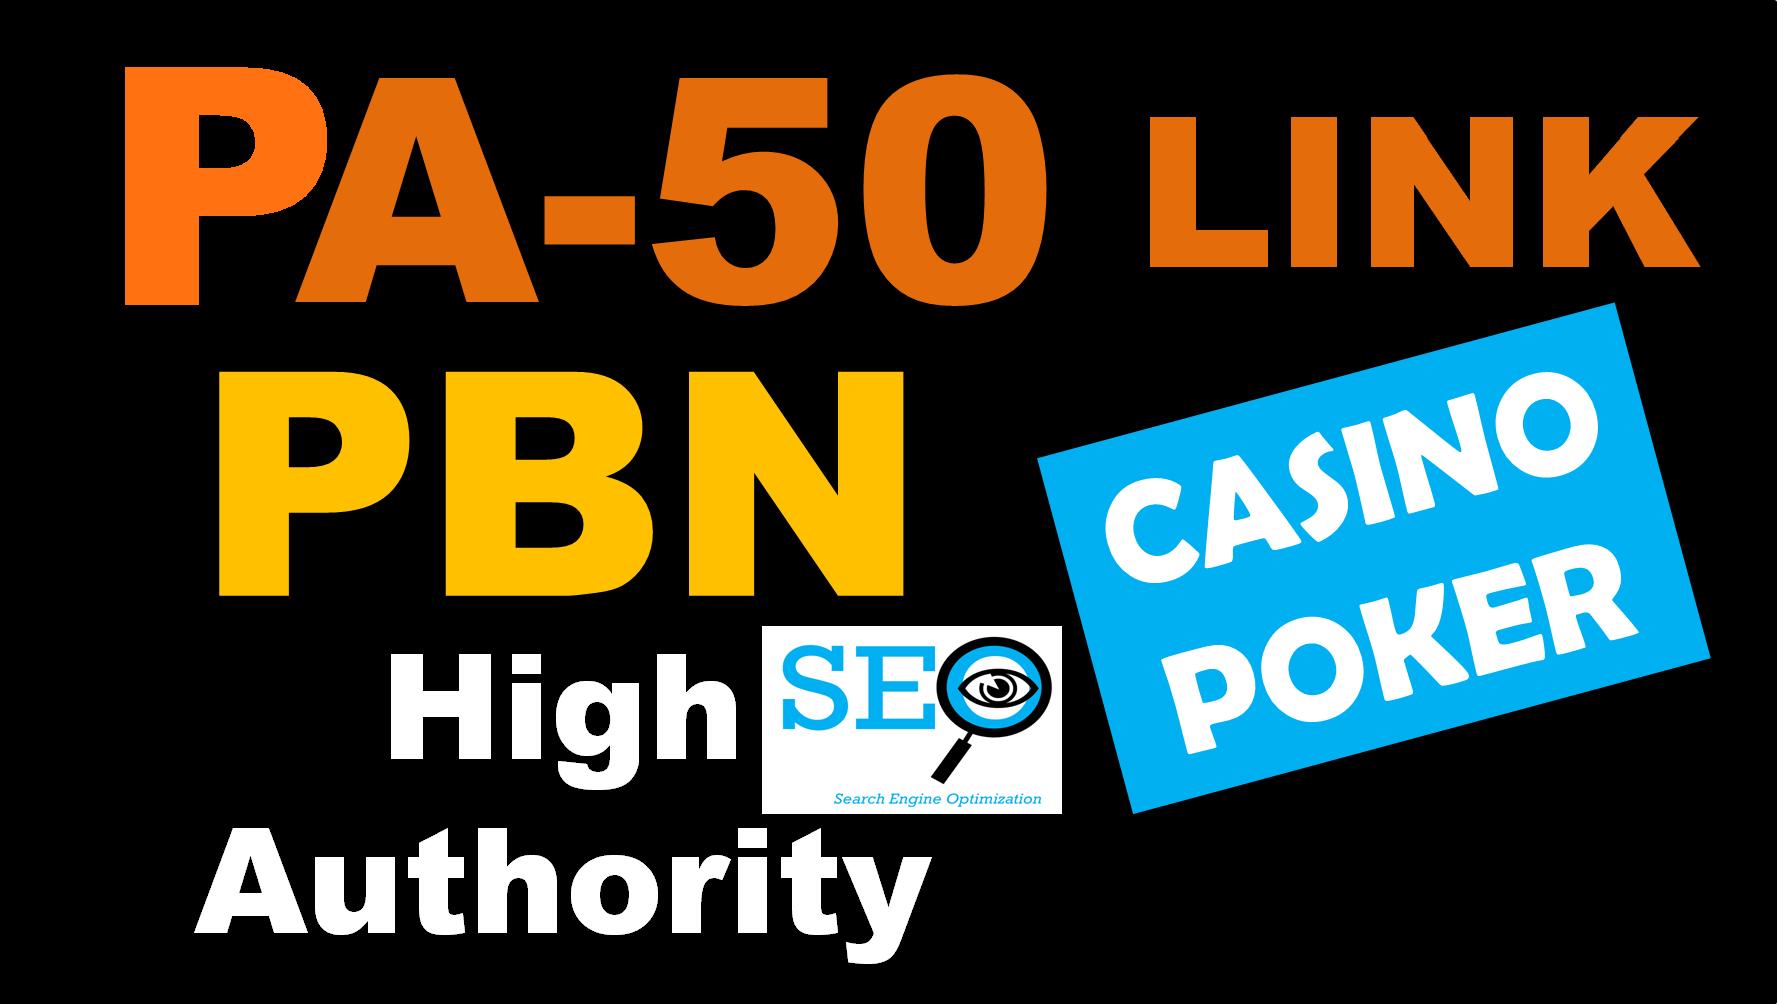 PBN - 50 JUDI BOLA,  CASINO,  POKER,  GAMBLING,  PBNs Post Boost Website Ranking